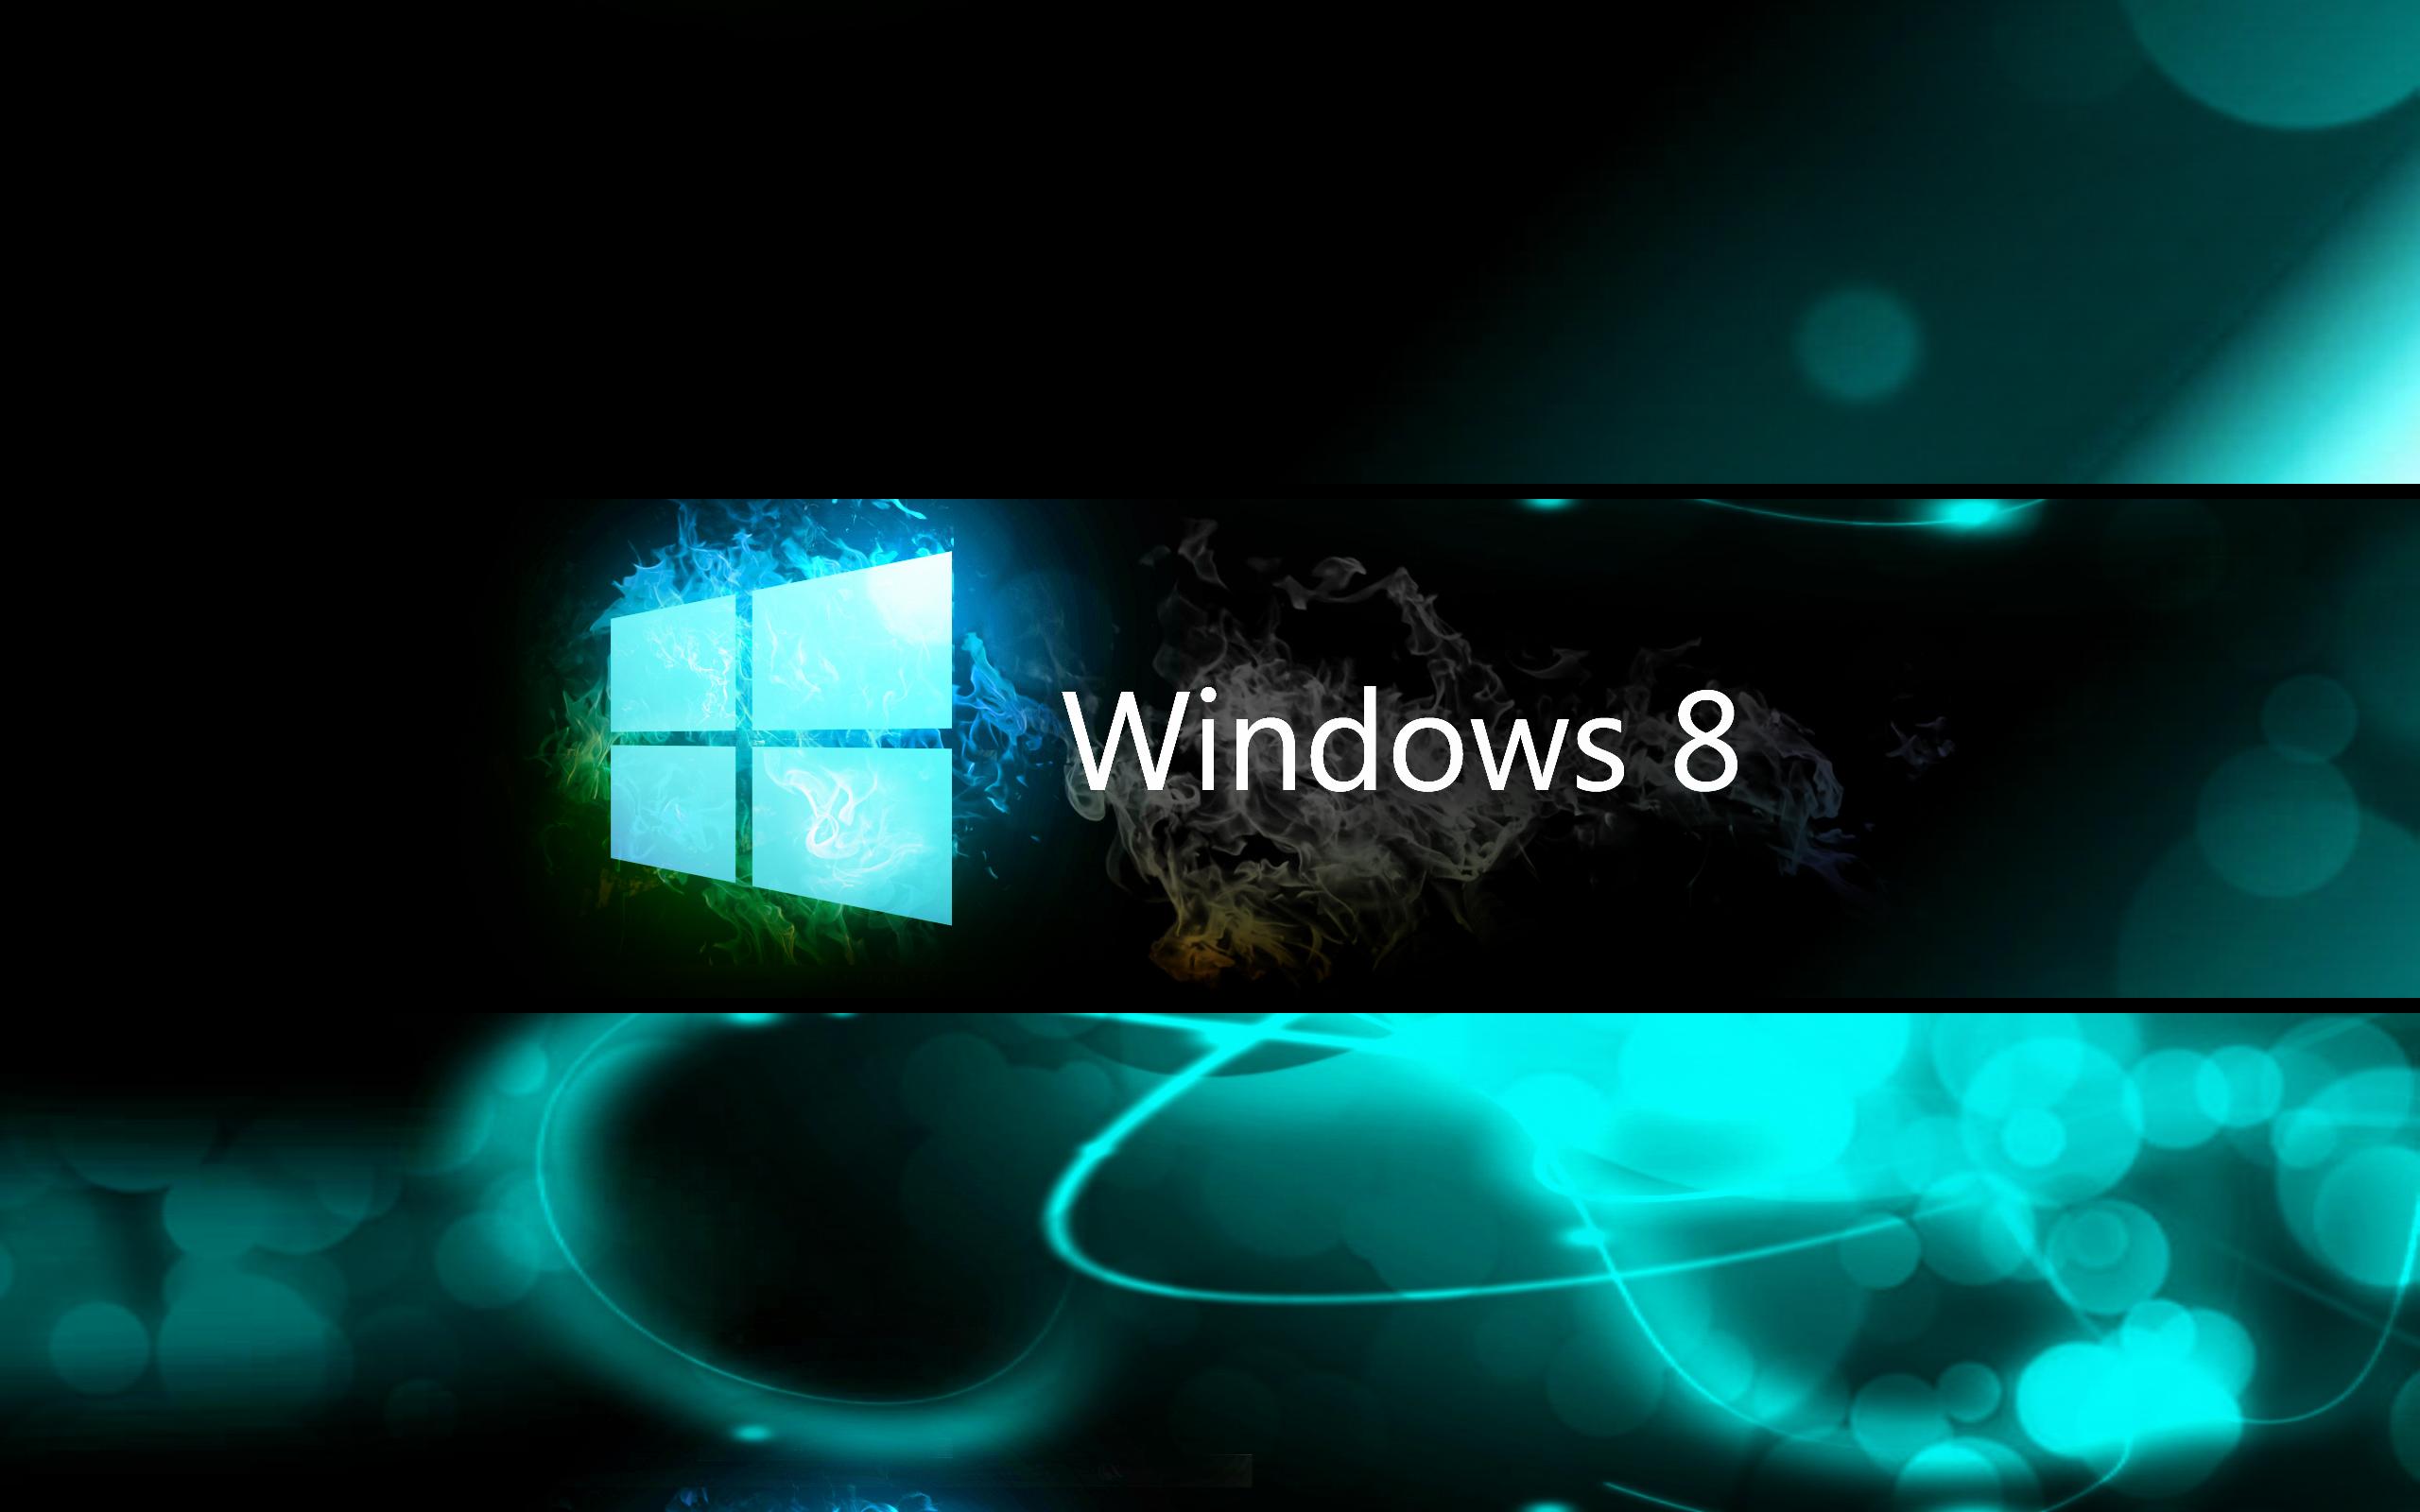 FC437 Windows 8 Wallpaper Windows 8 Pics In High Quality 2560x1600